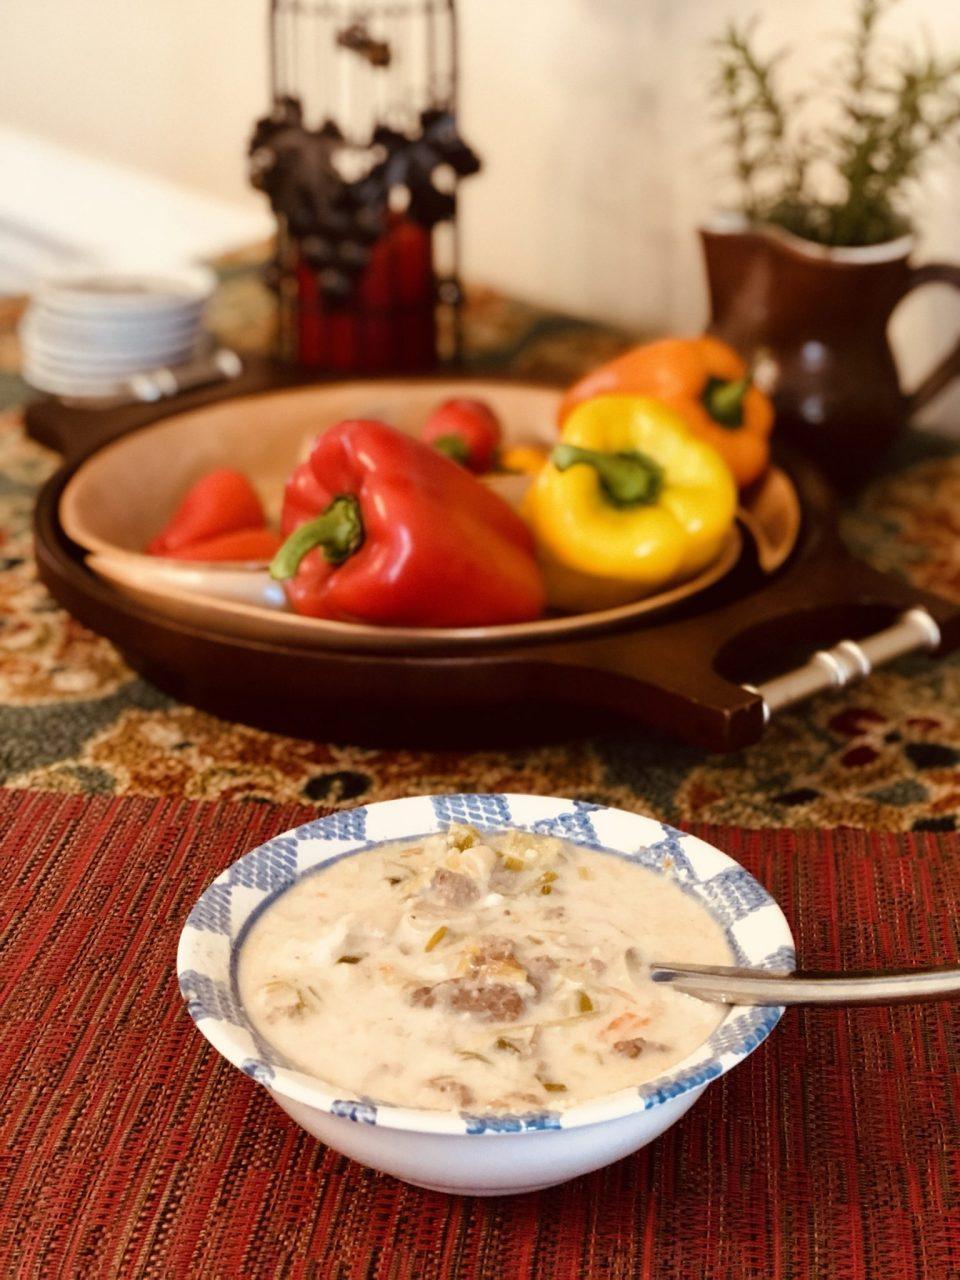 Creamy Garlic-Leek Soup